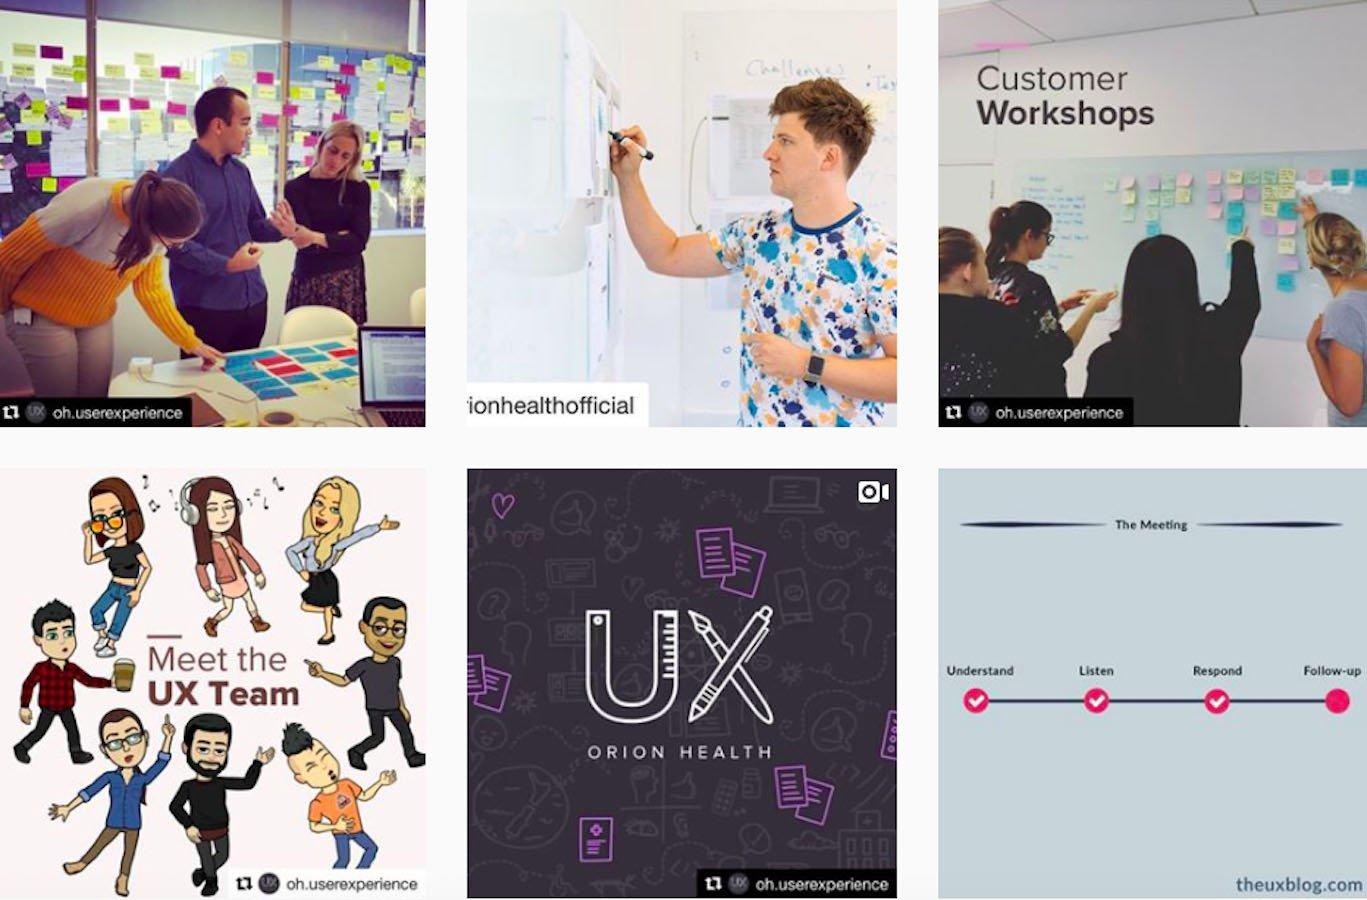 Web Design Inspiration: 110+ Accounts On Instagram and 10+ Best UX & Web Design Books in 2020 - nicholastenhue